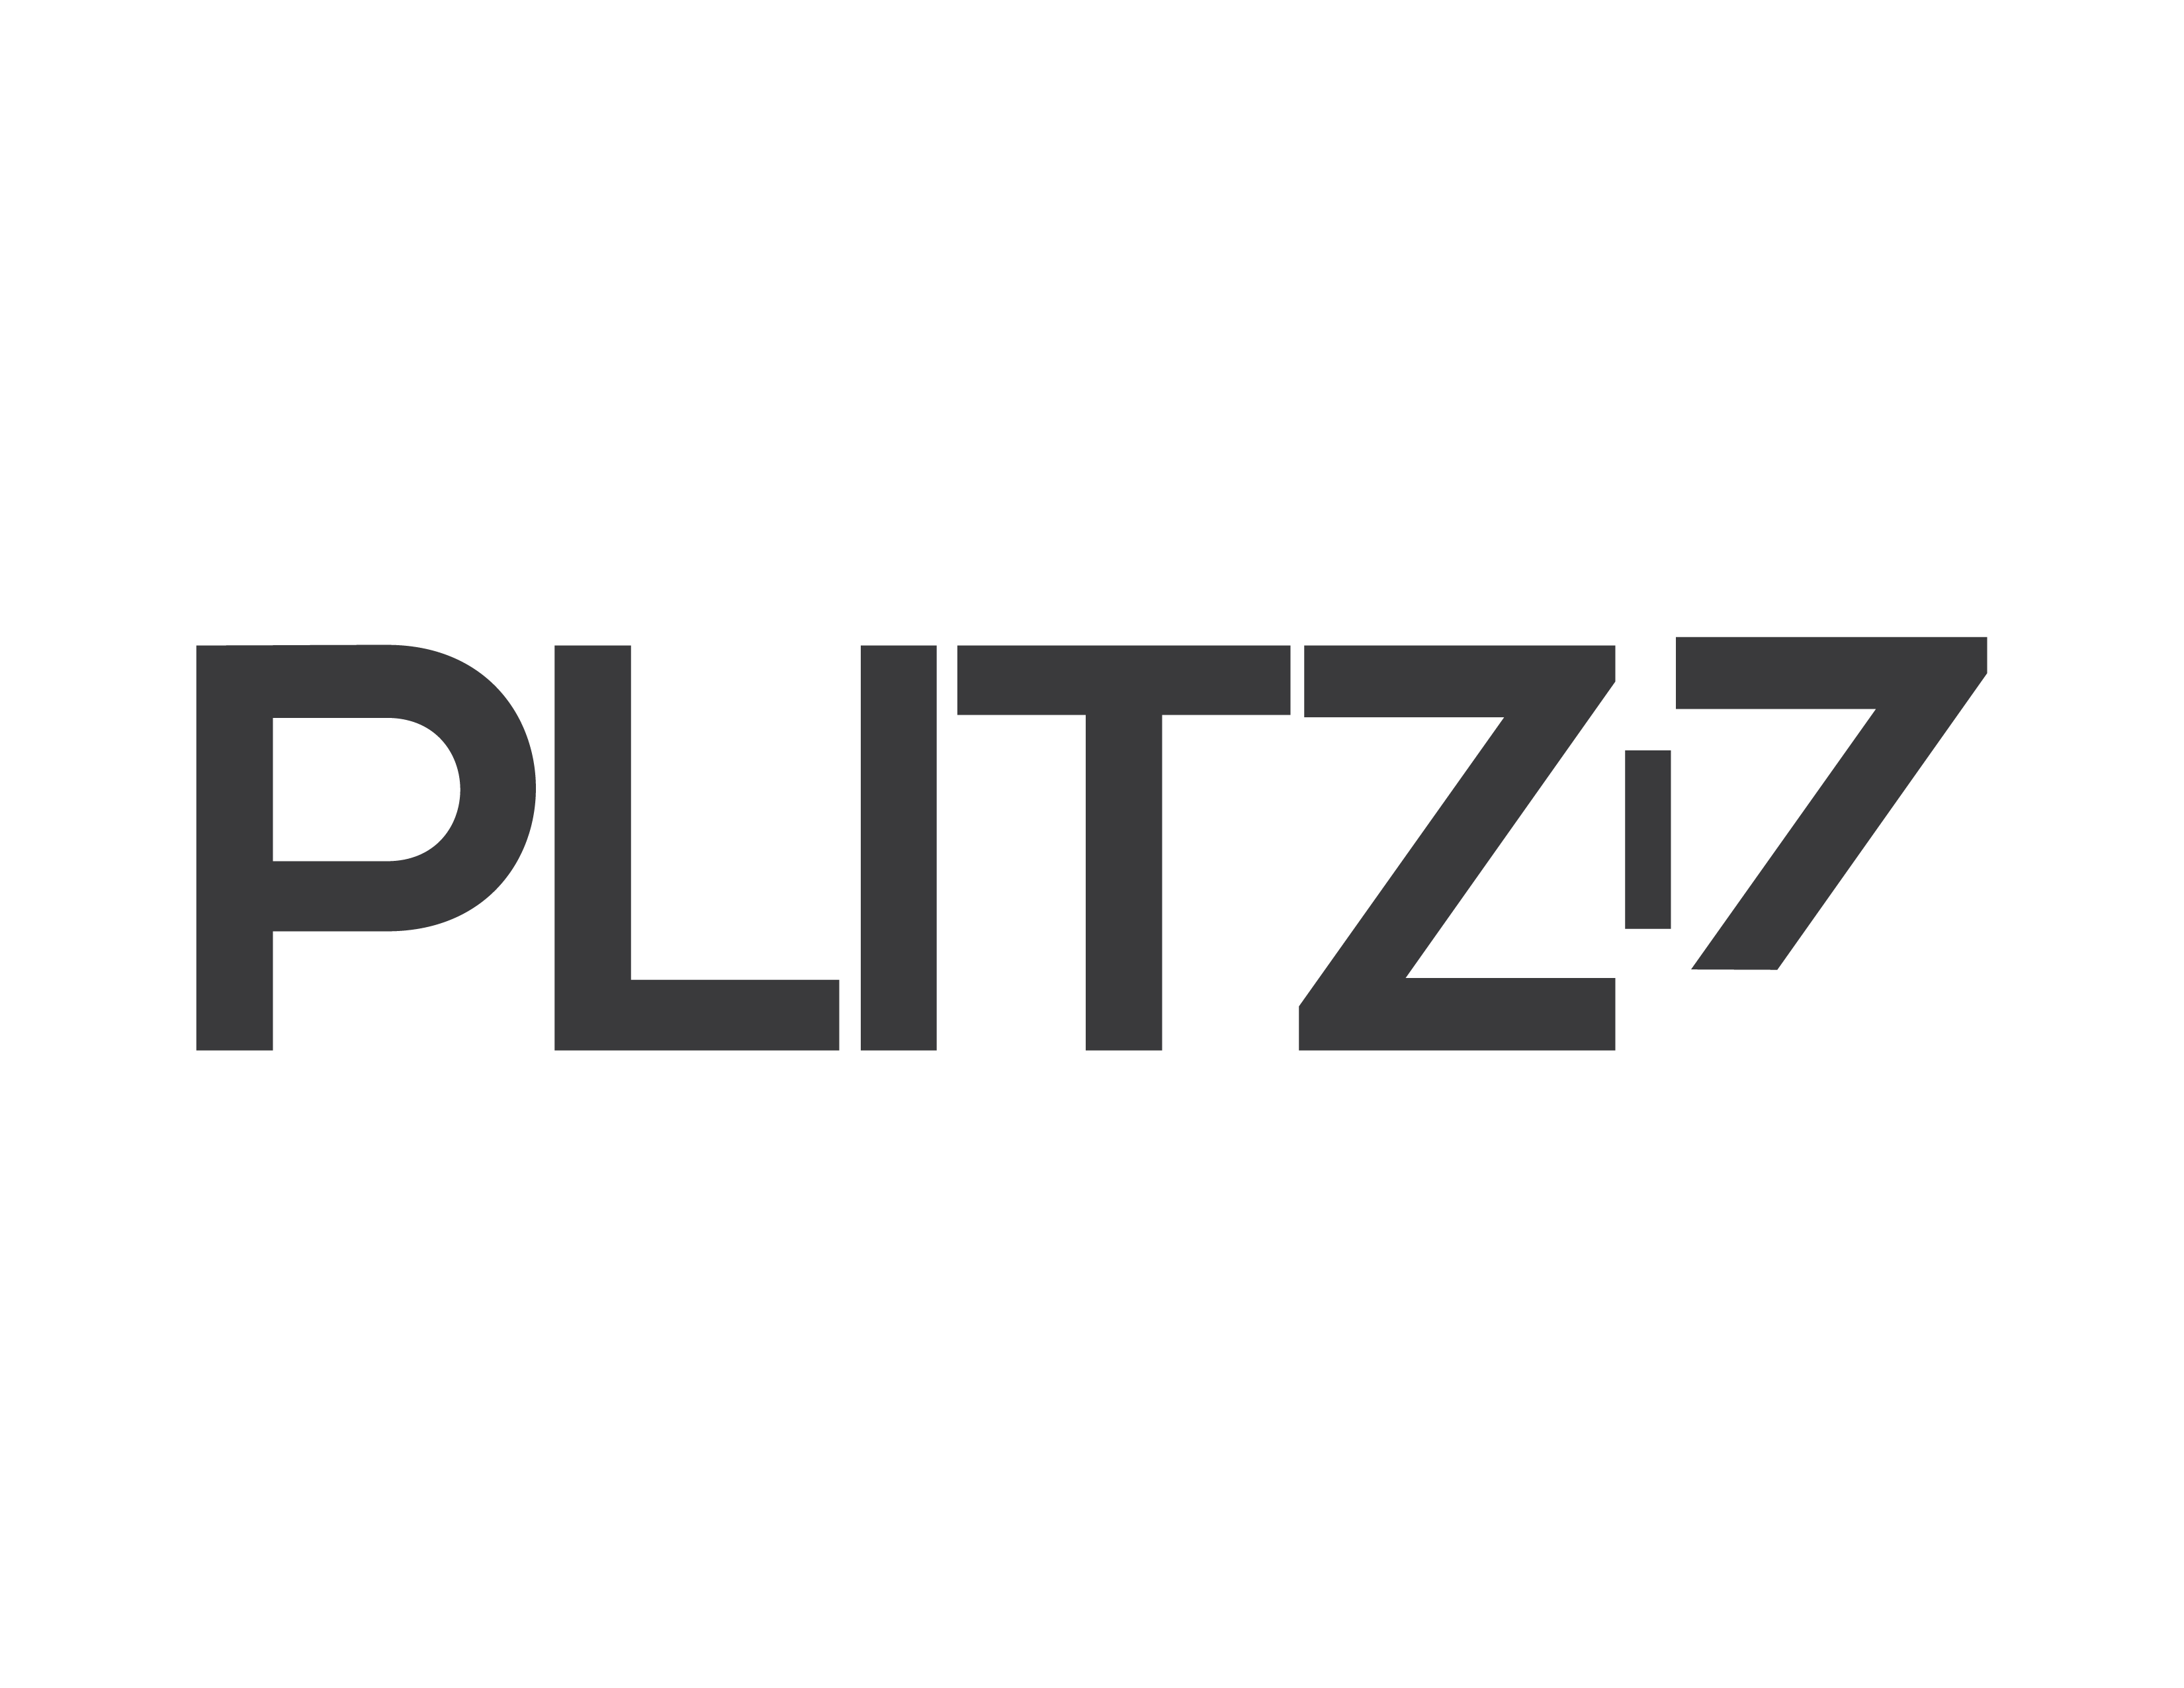 Plitz7 Logo